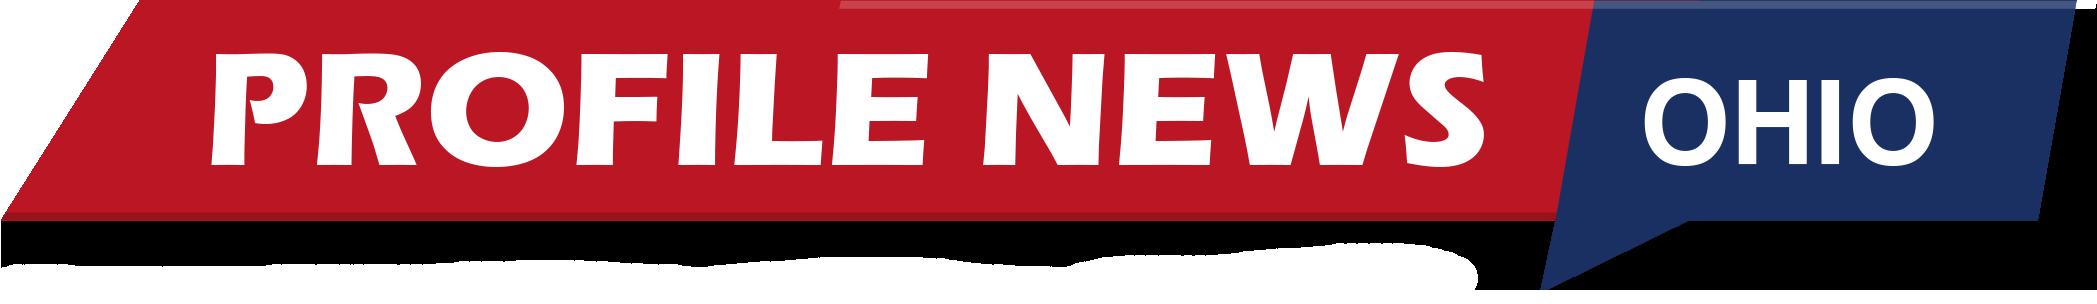 Profile News Ohio